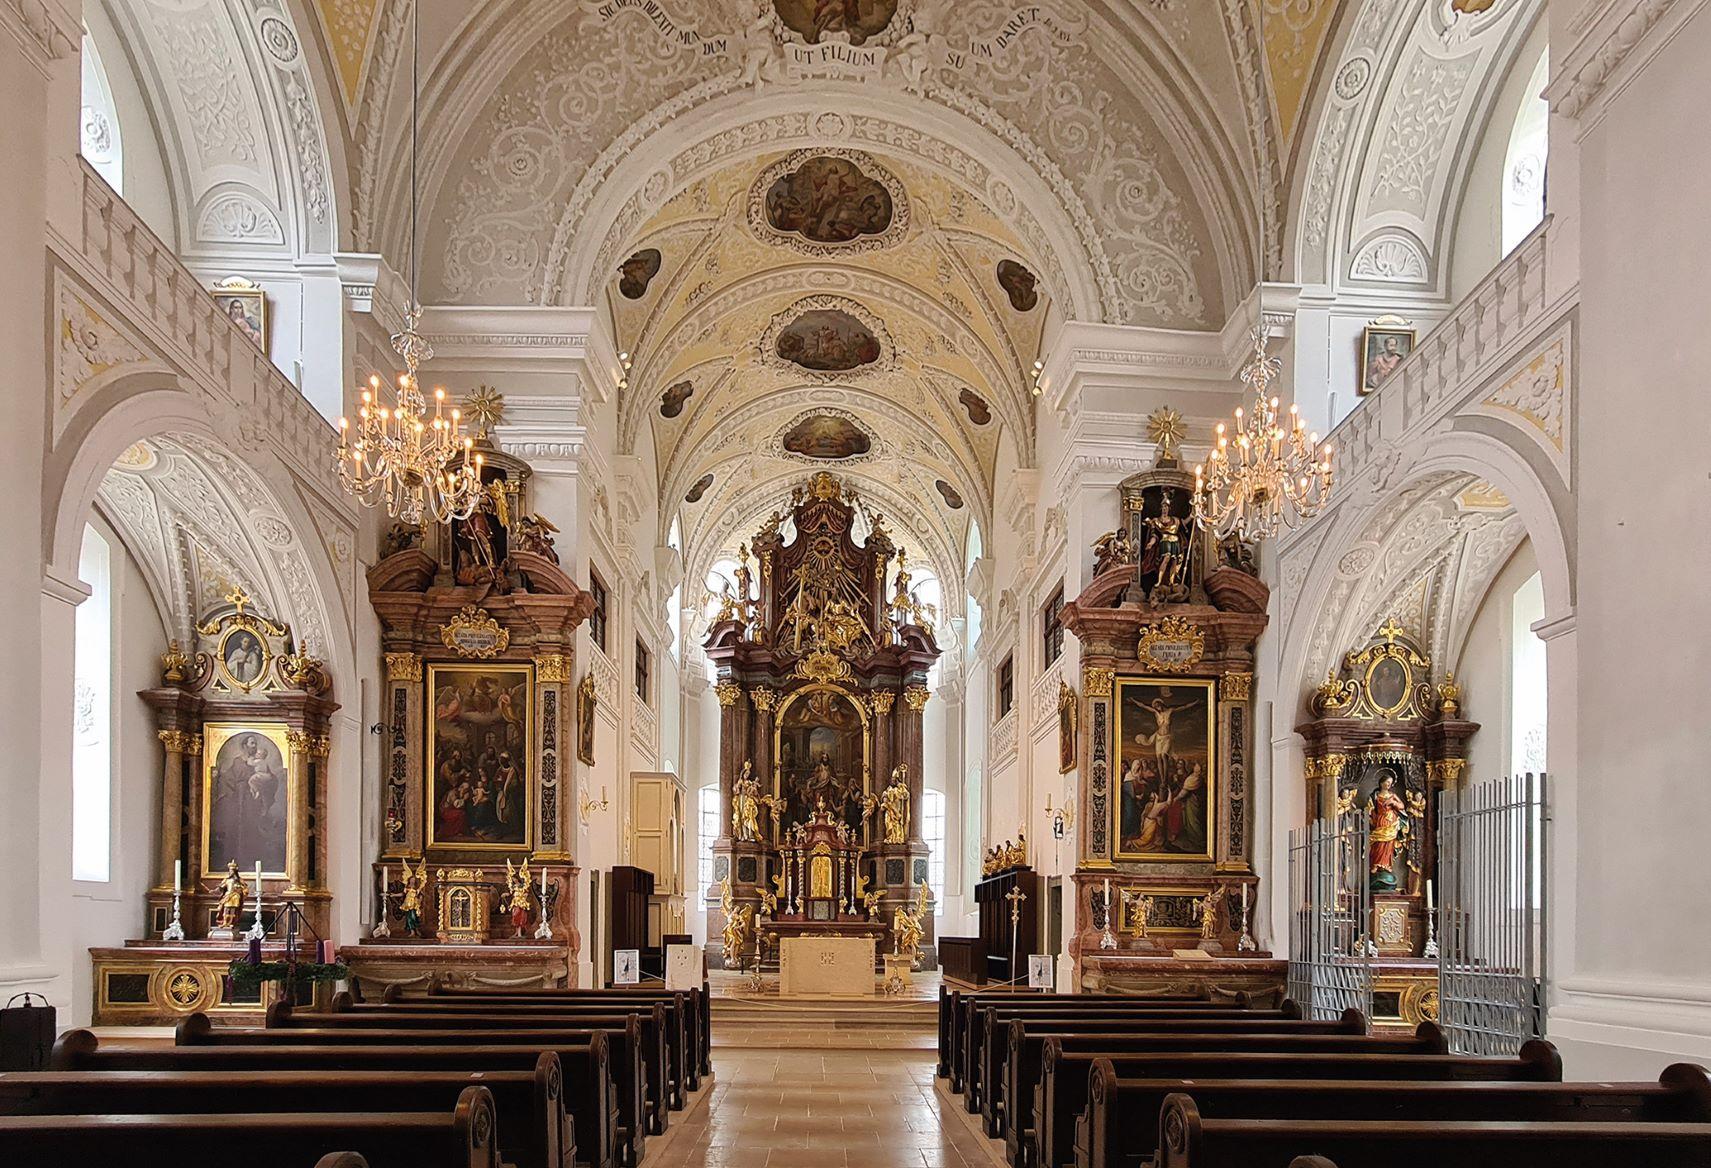 Stadtpfarrkirche St. Oswald Altar